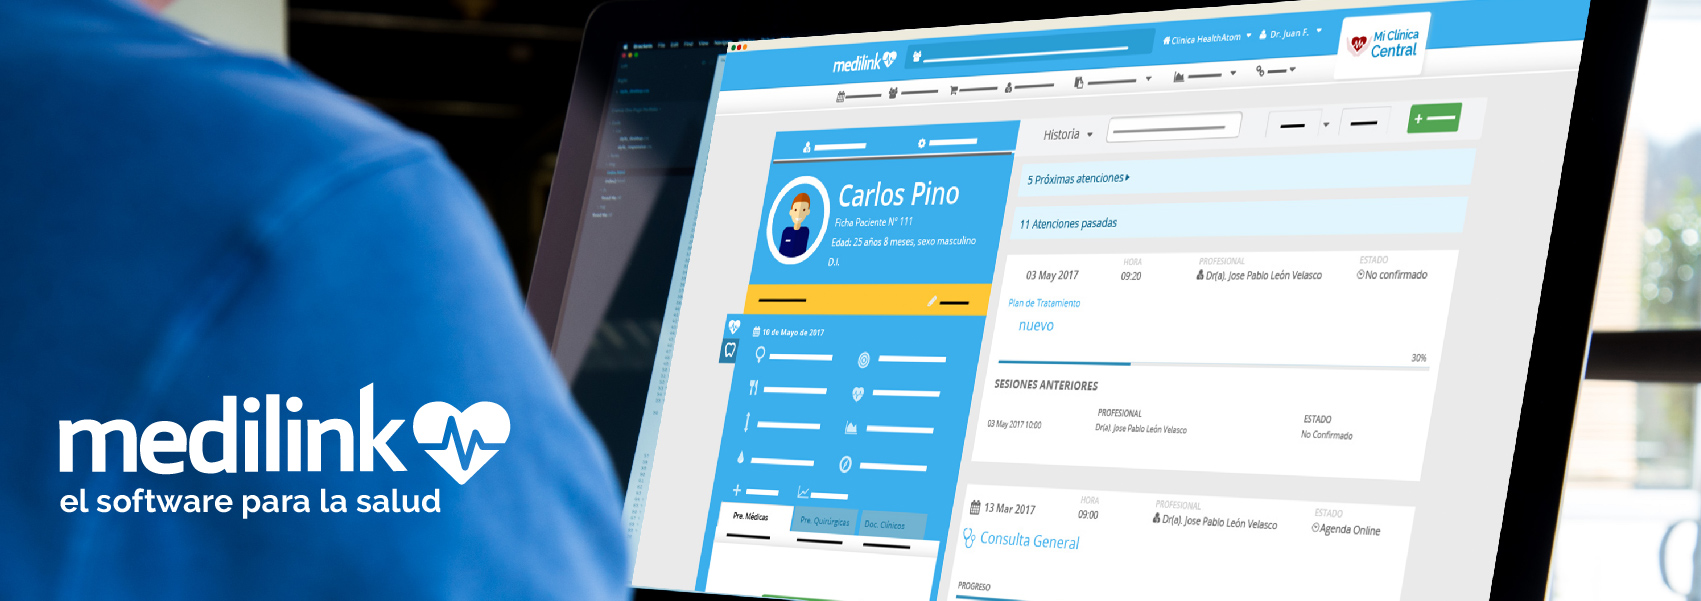 Medilink vs Malware: La seguridad en la nube